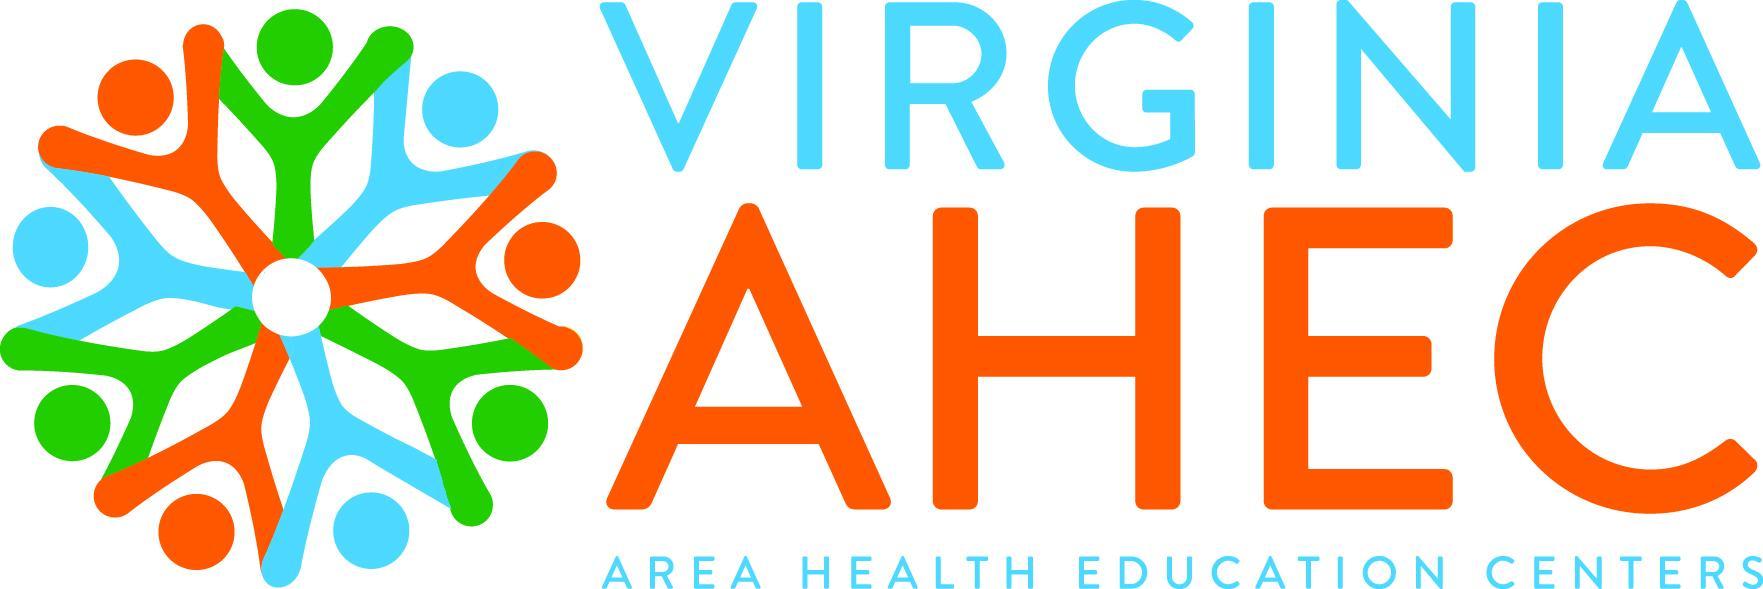 Area Health Education Centers Program Virginia Health Workforce Development Authority